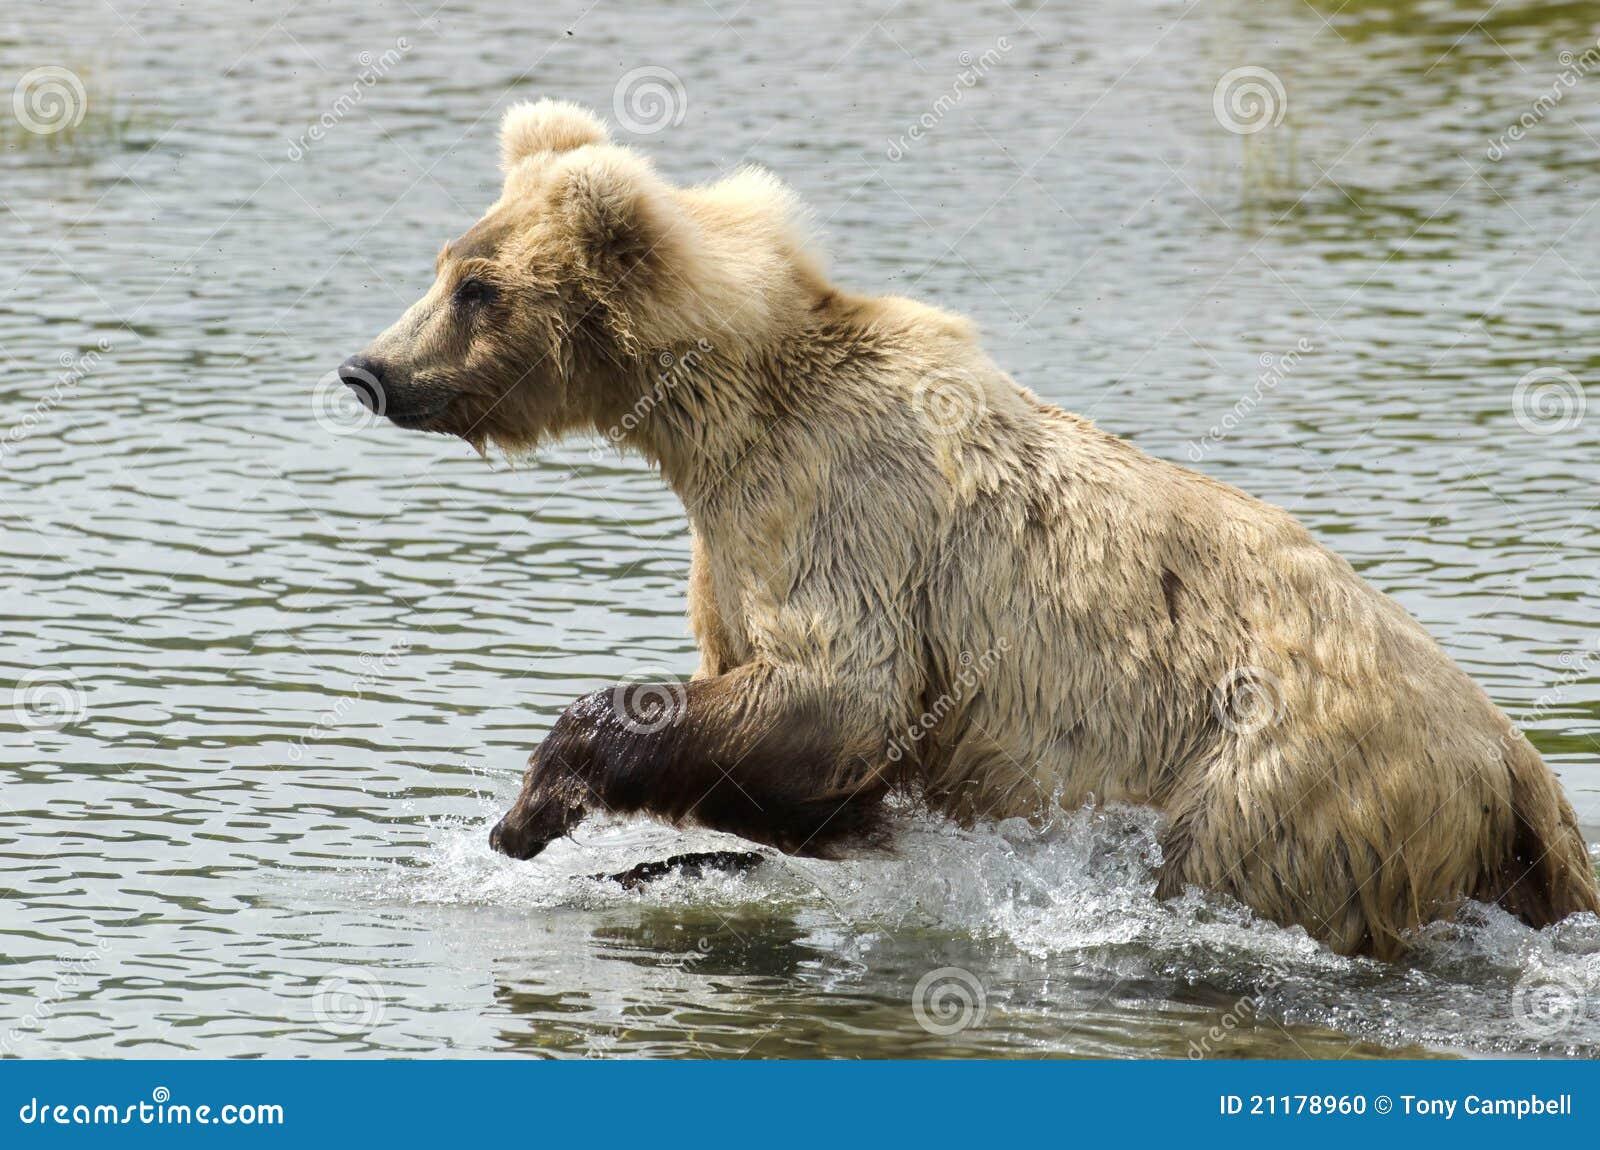 Brown bear running in water